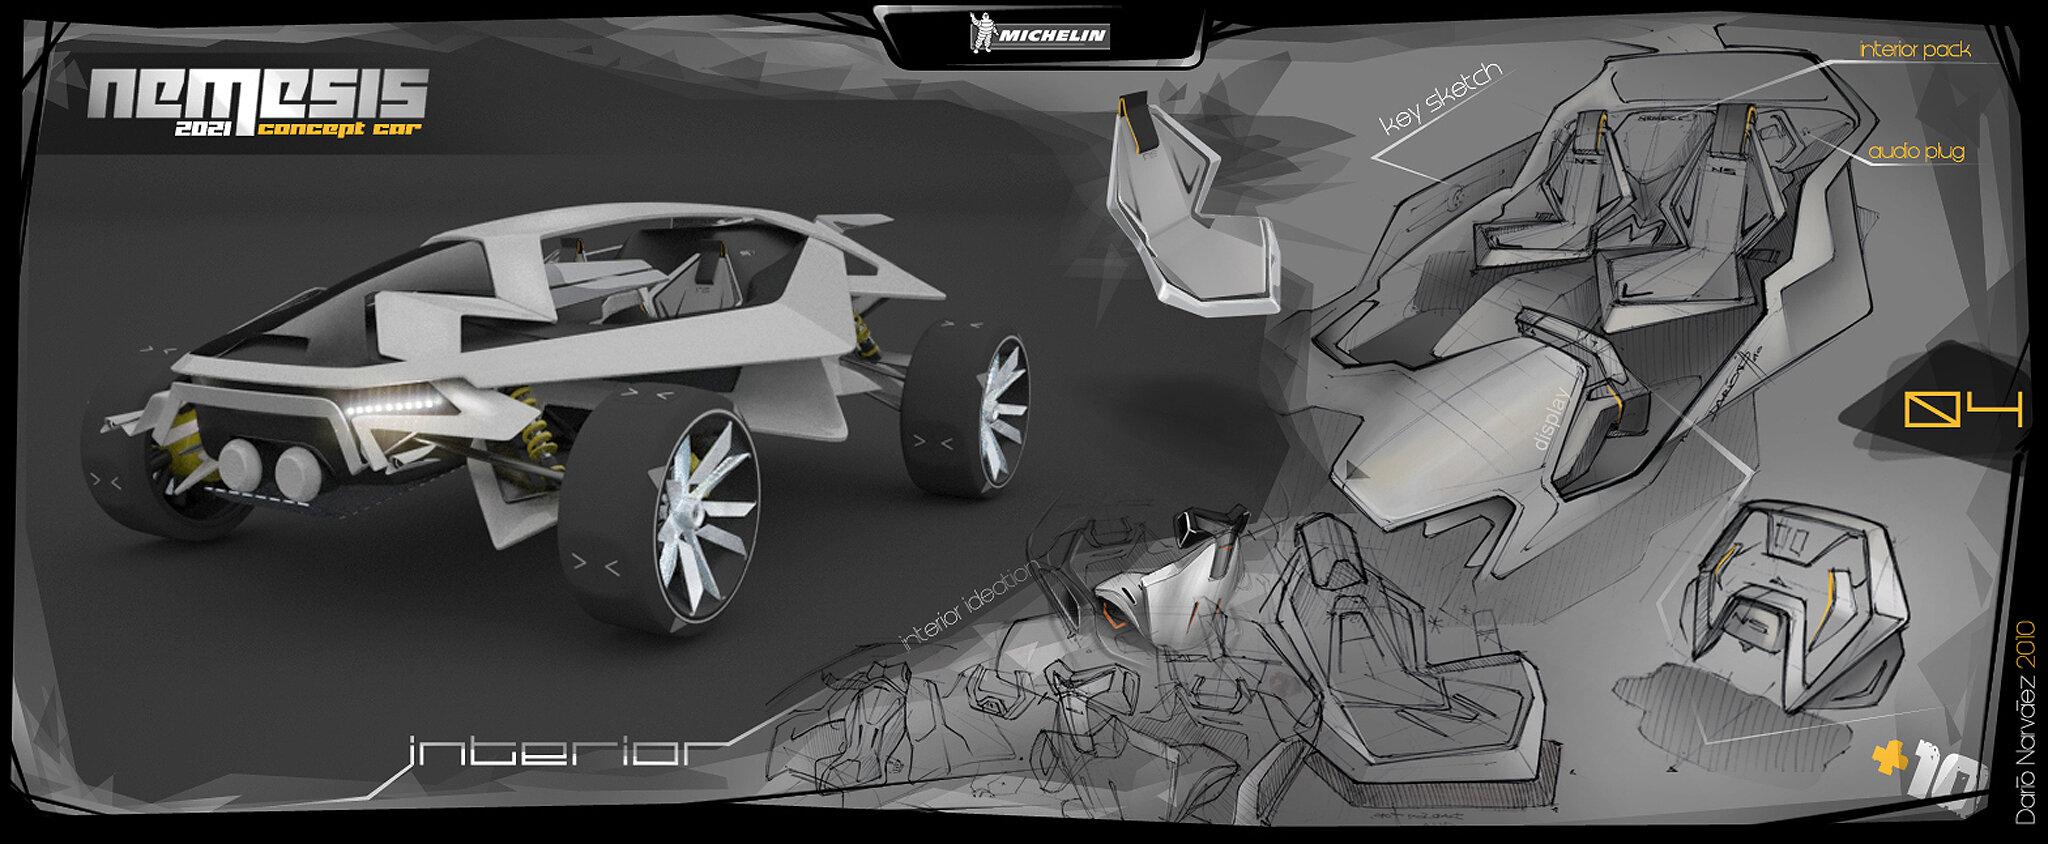 Nemesis_concept_car_final_05_source.jpg